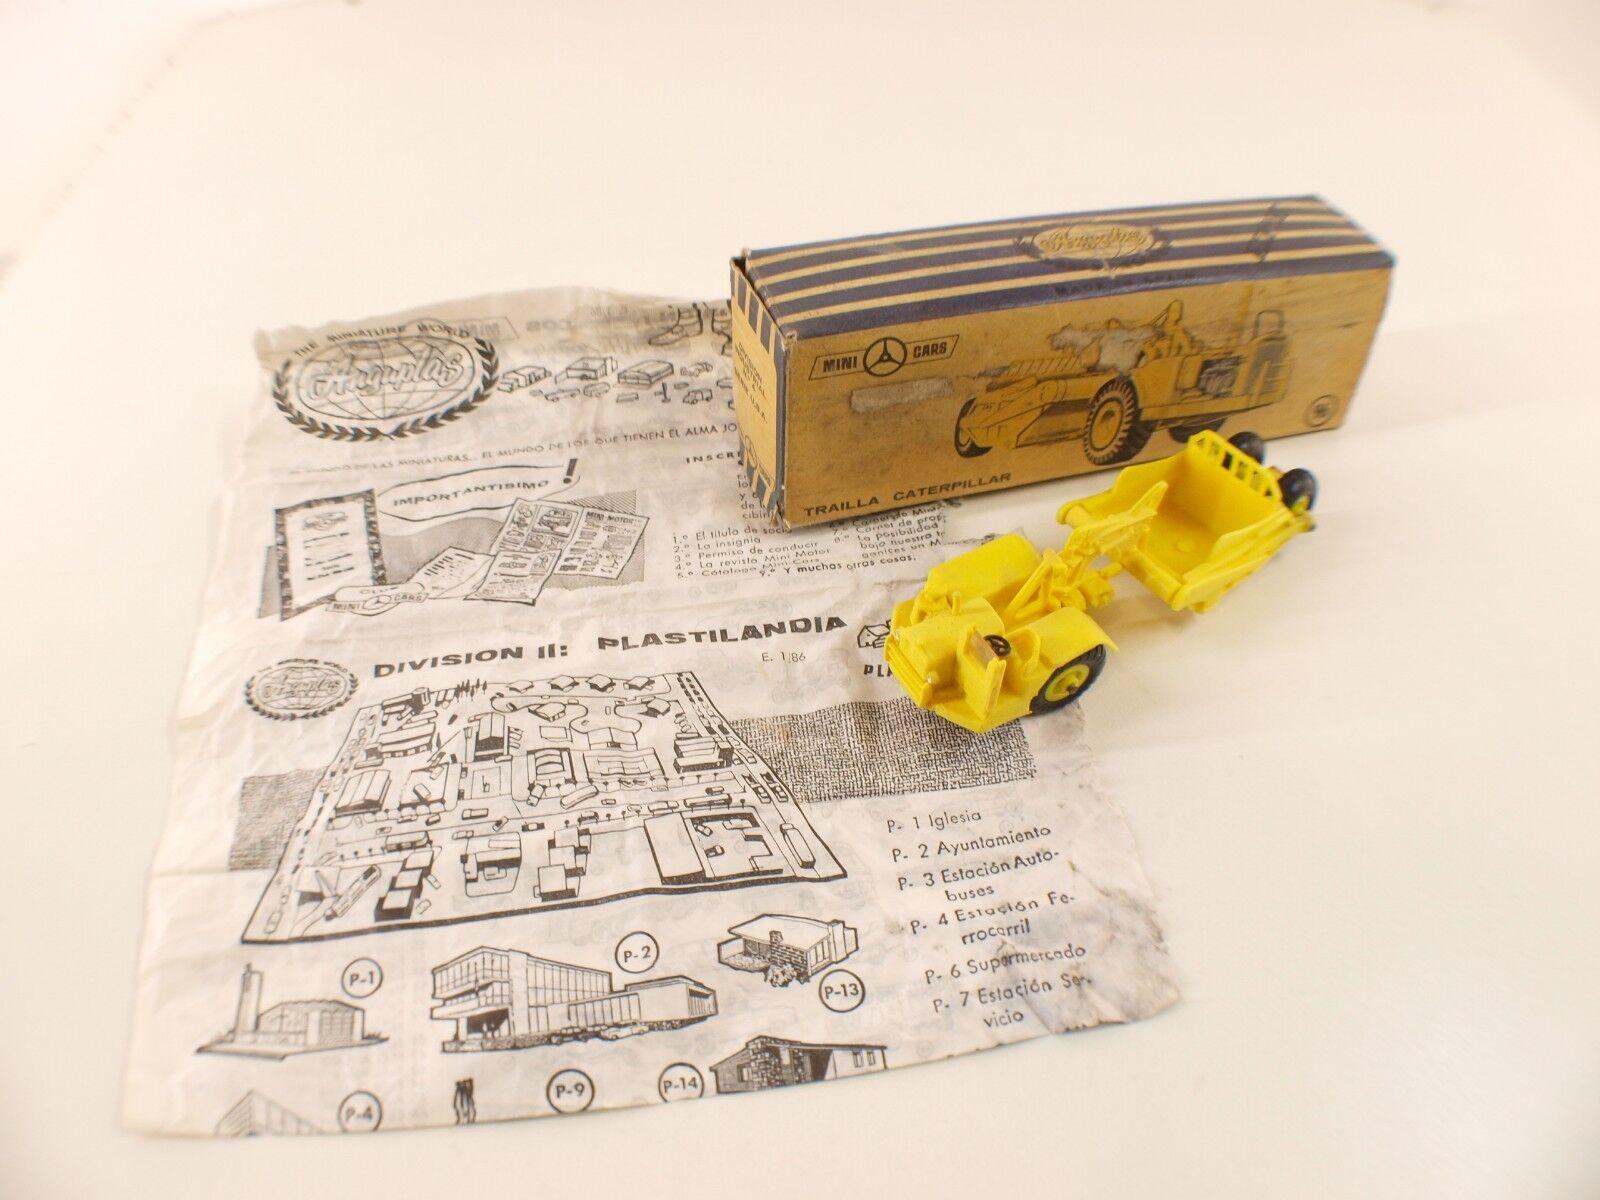 Anguplas Mini Cars N°4 • Trailla Caterpillar • Espagne •  1 86 en boite   boxed